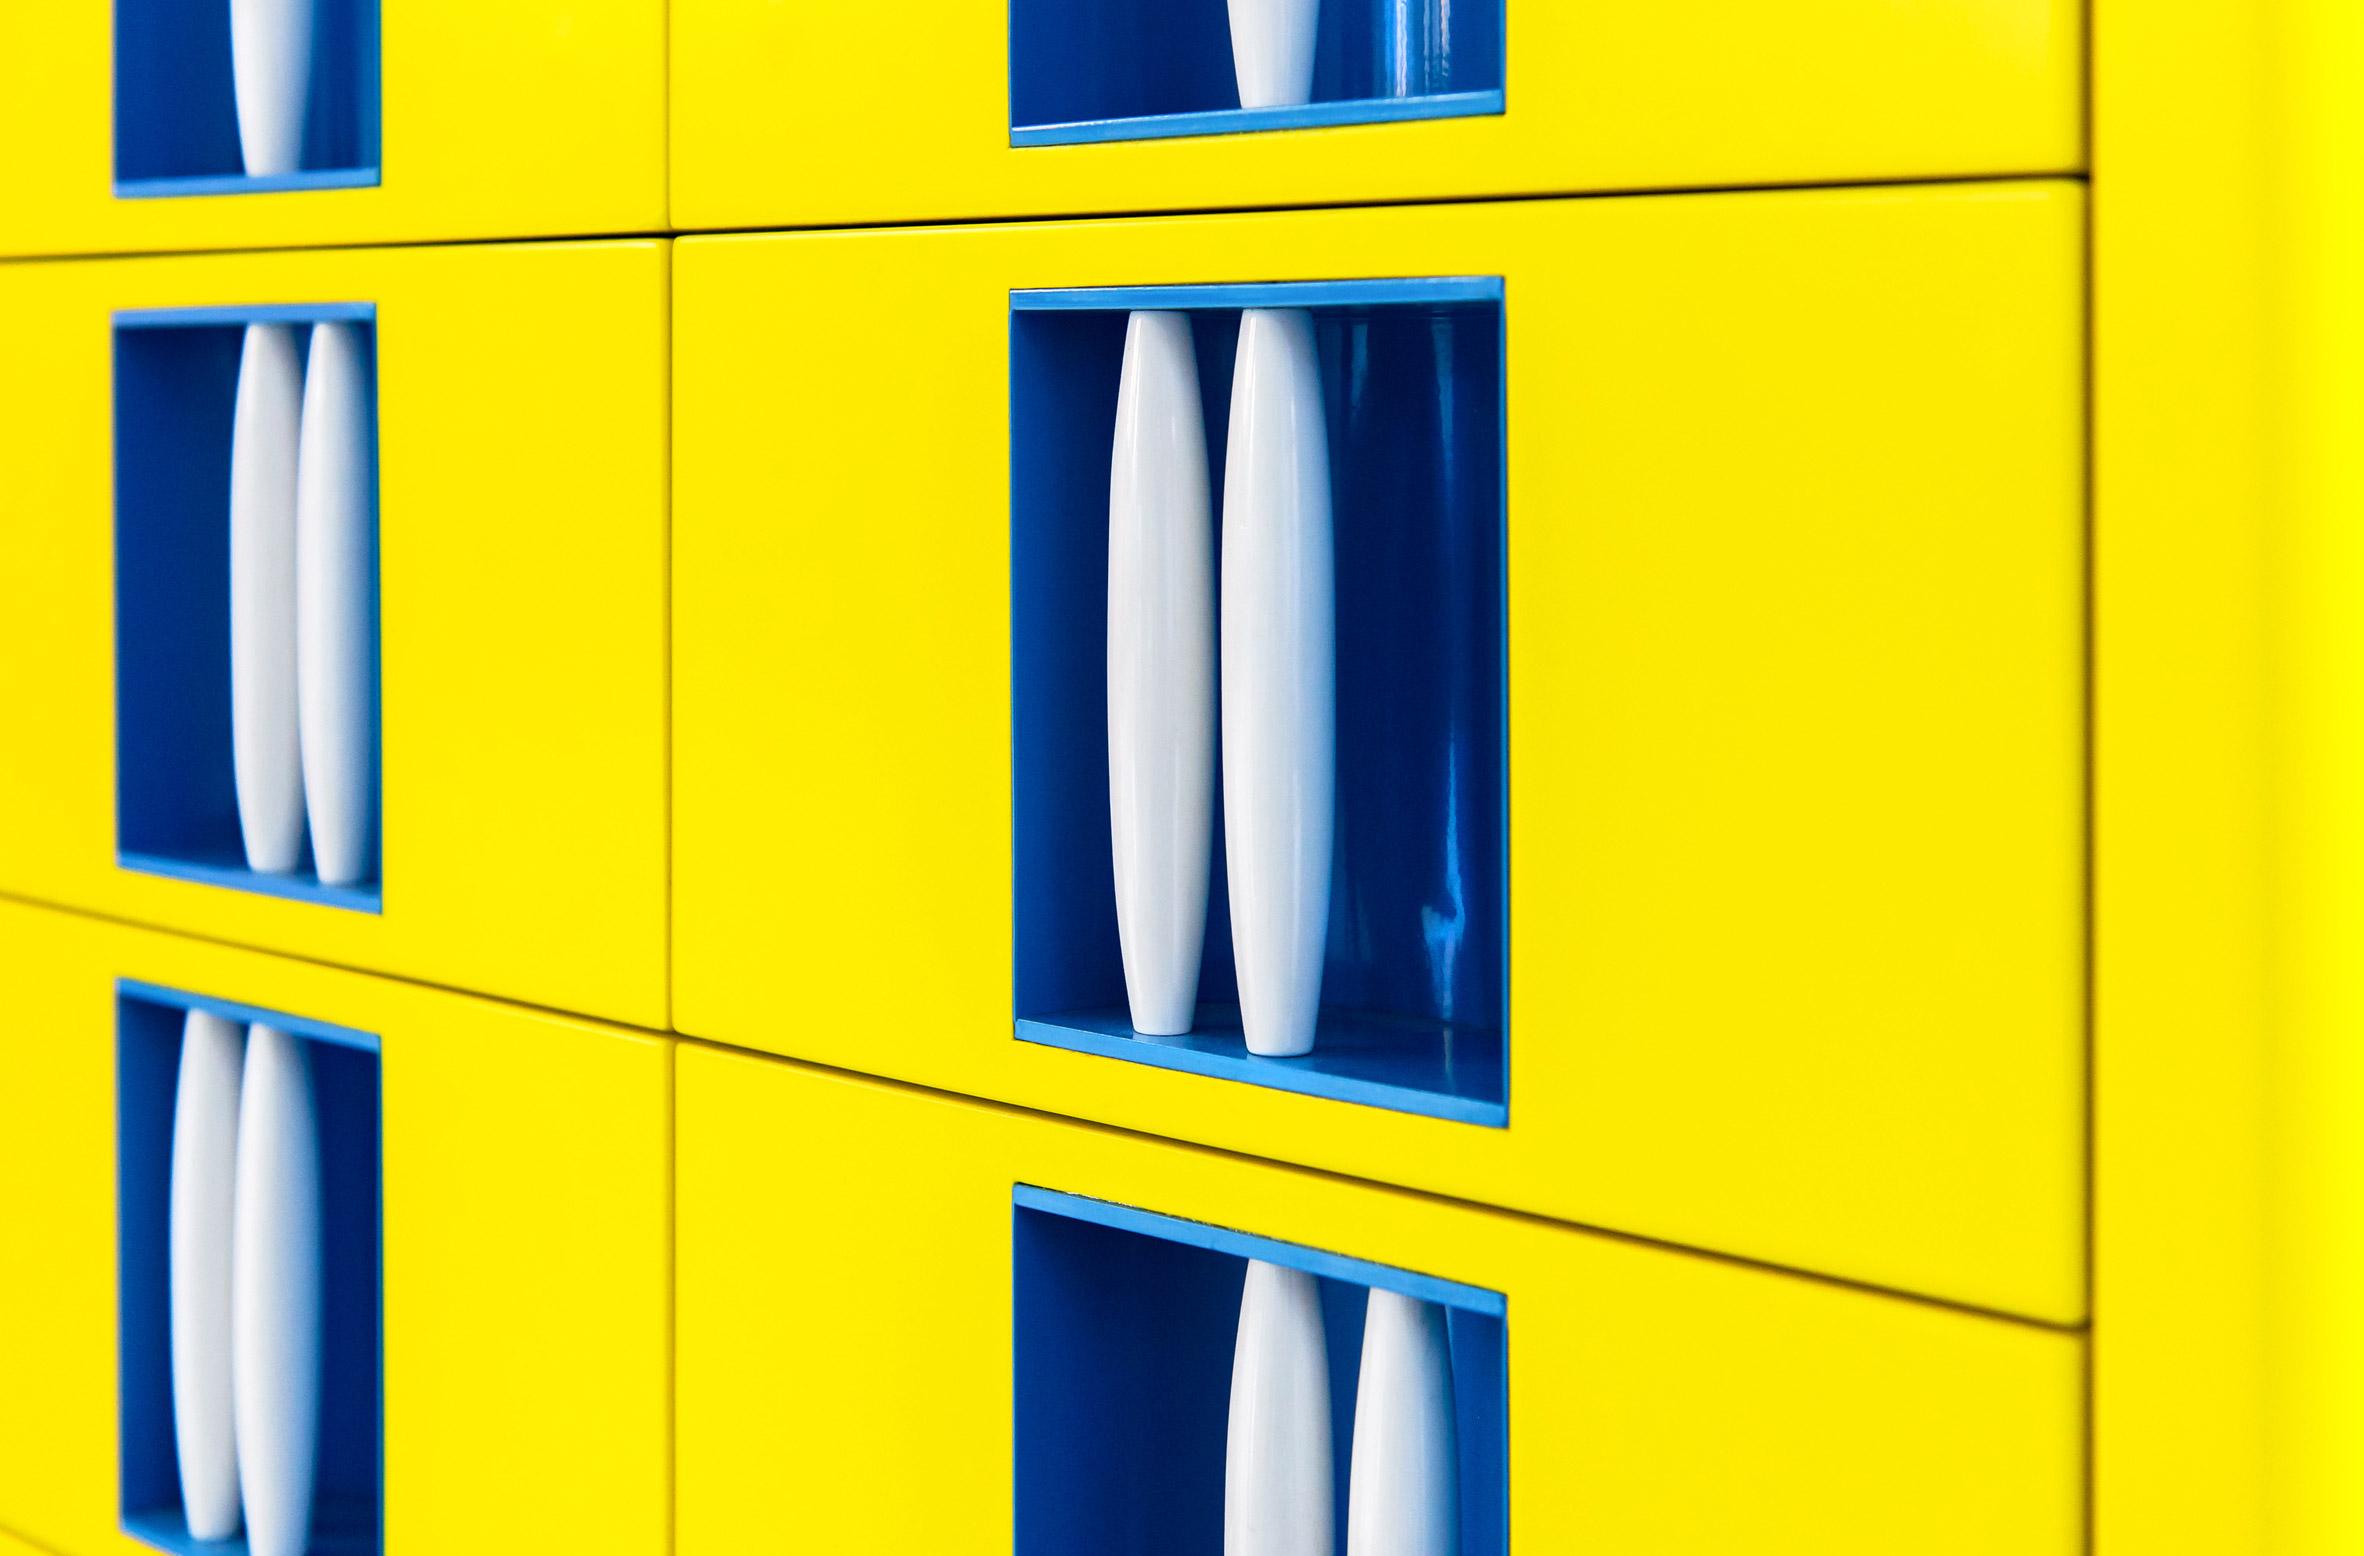 nakano-twins-adam-nathaniel-furman-furniture-design_dezeen_2364_col_21.jpg